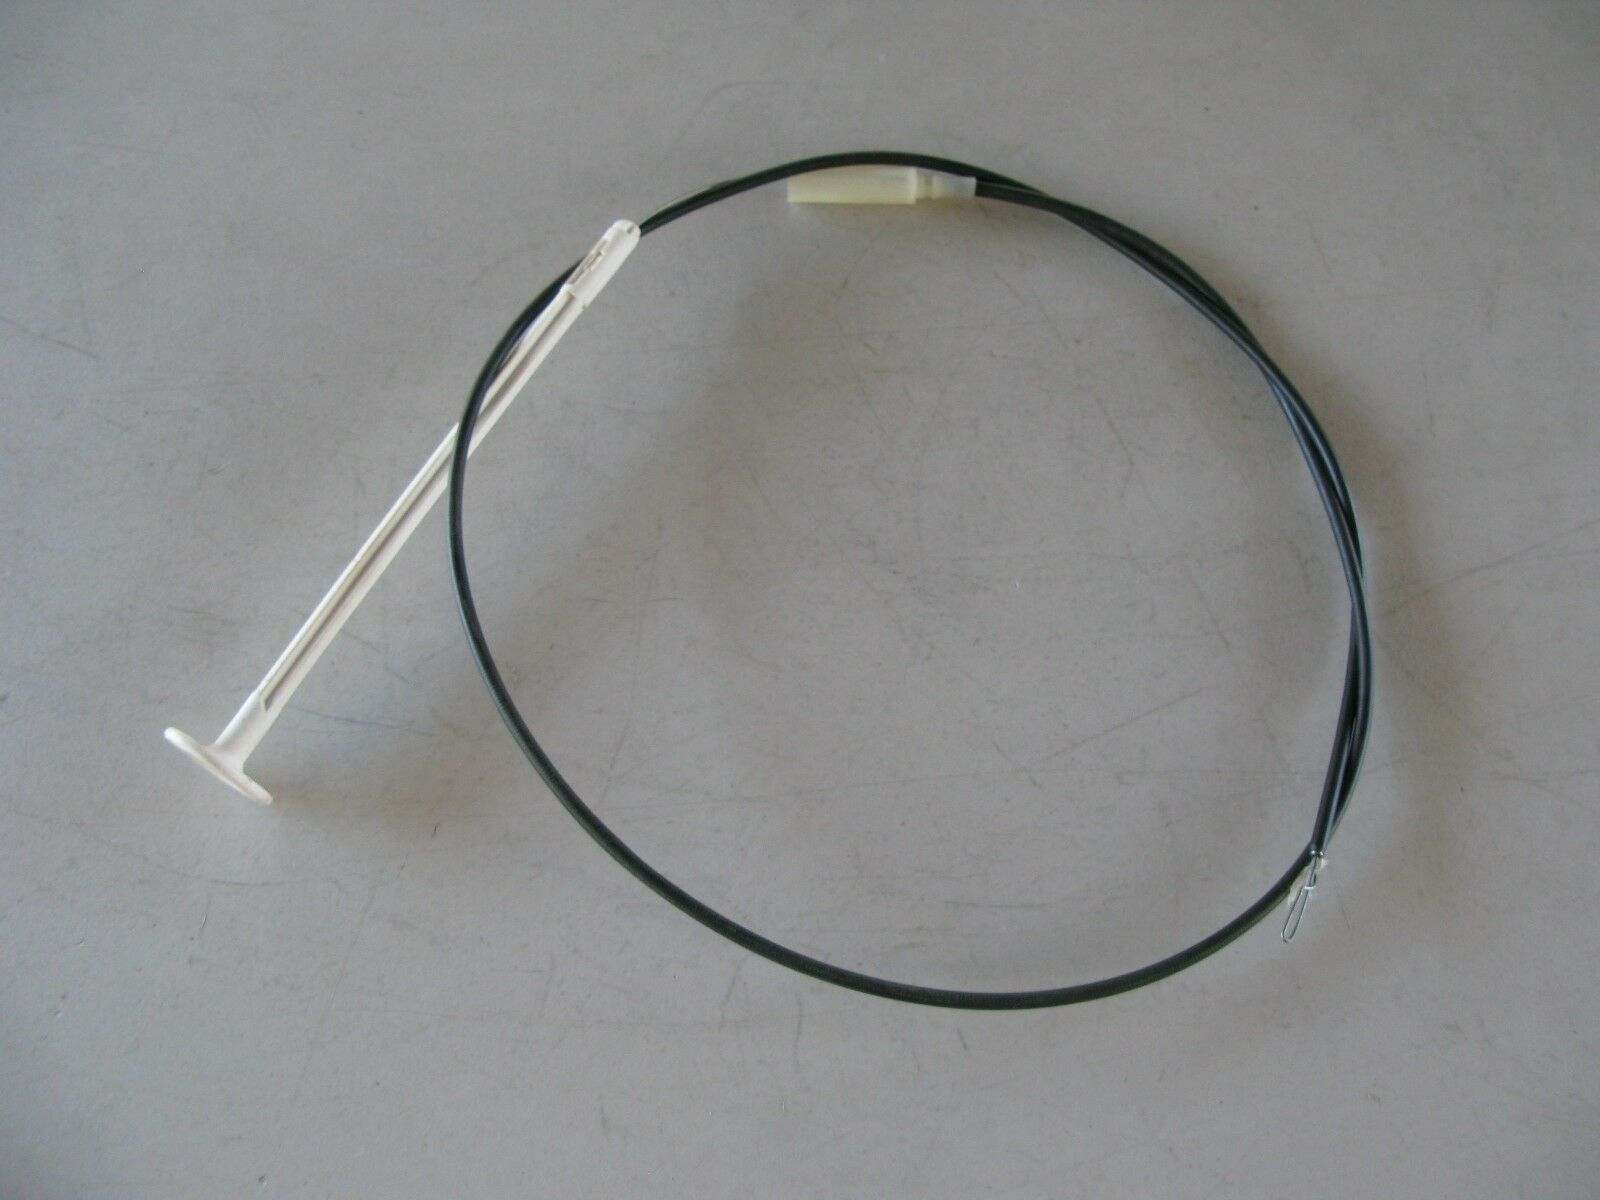 For Porsche 944 924 Speedometer Cable Original Equipment 142 957 801 C